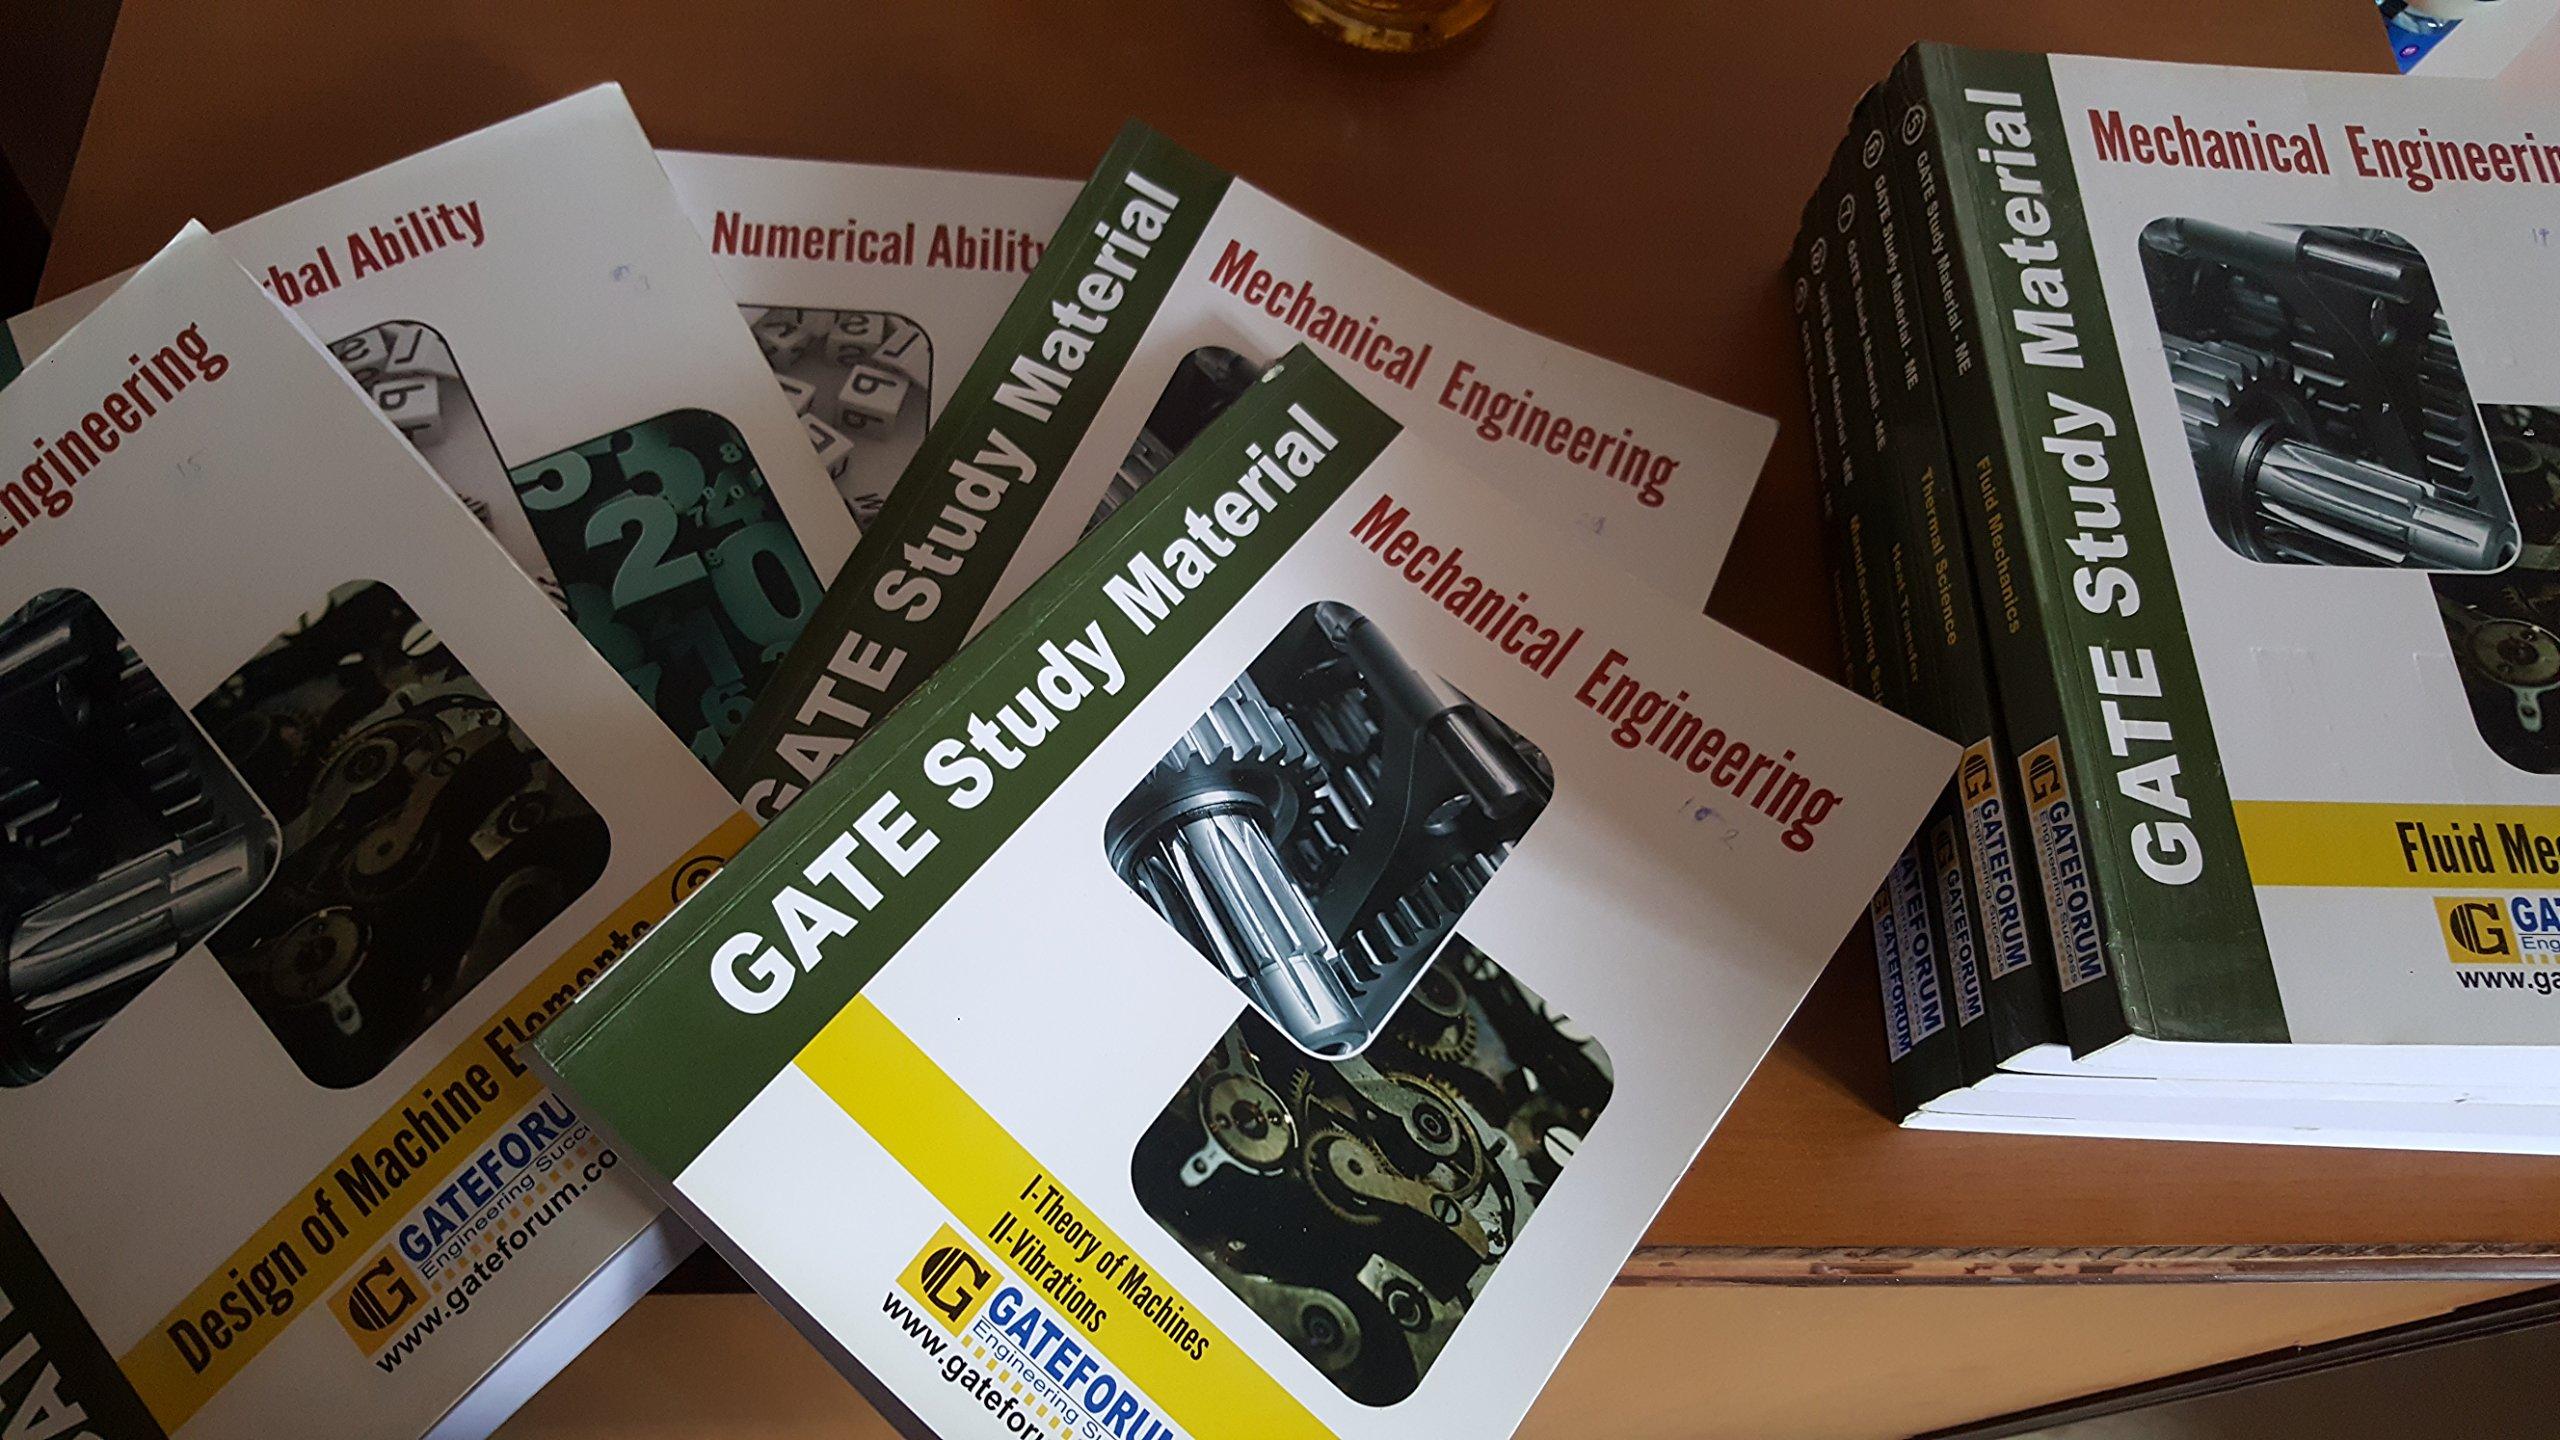 Amazon in: Buy Gateforum academy Gate Study material mechanical